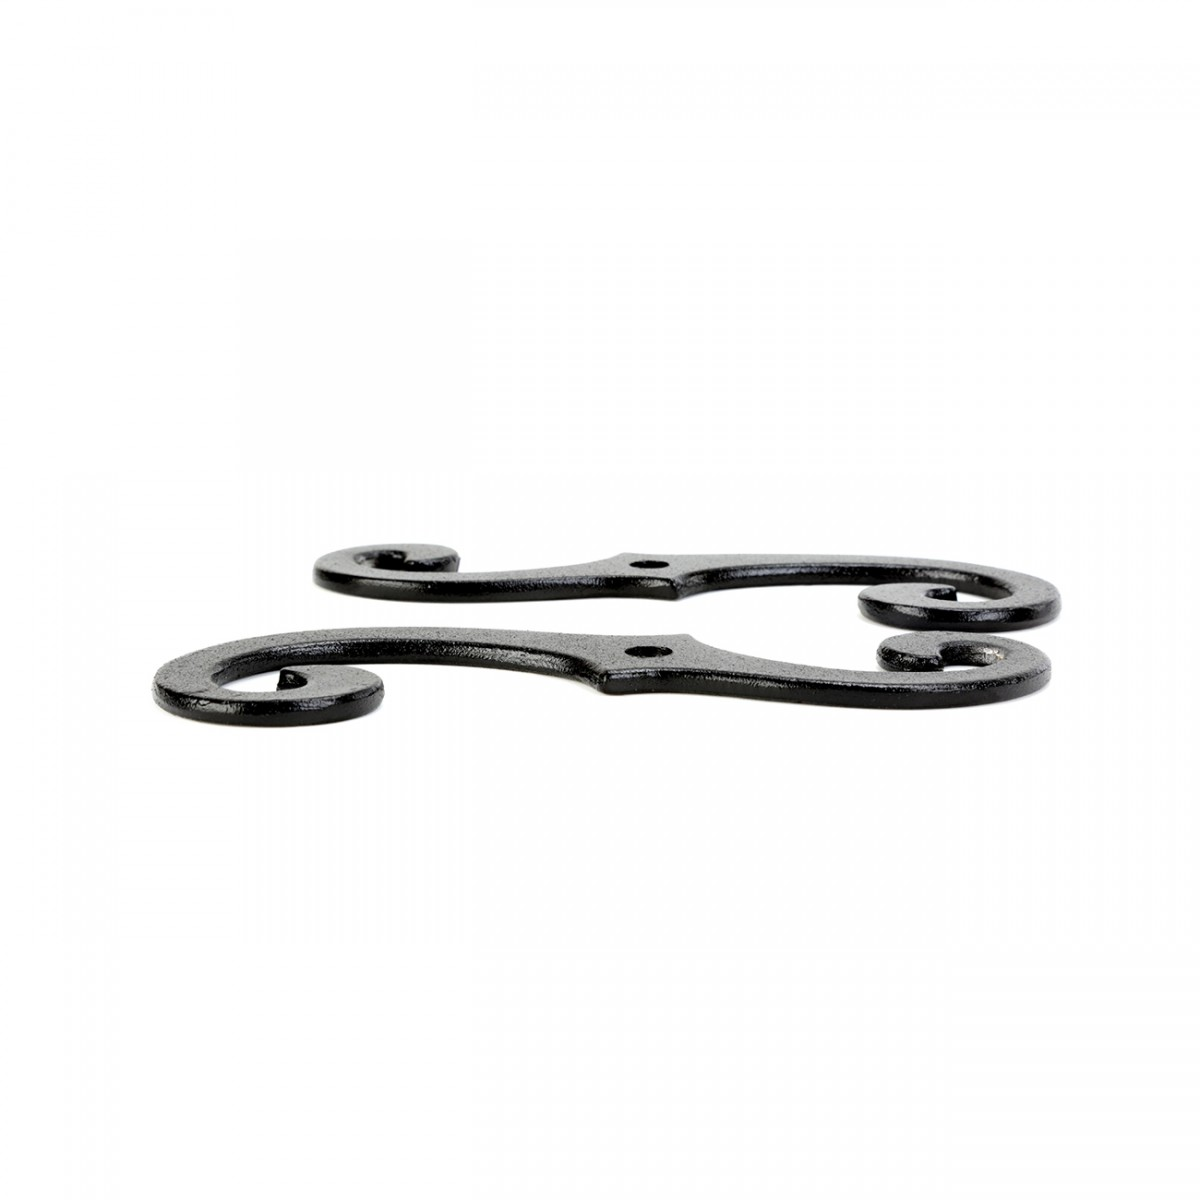 Black Aluminum Scroll Shutter Dog 612 6 pairs Shutter Dog Shutter Hardware Shutter Dog Pairs